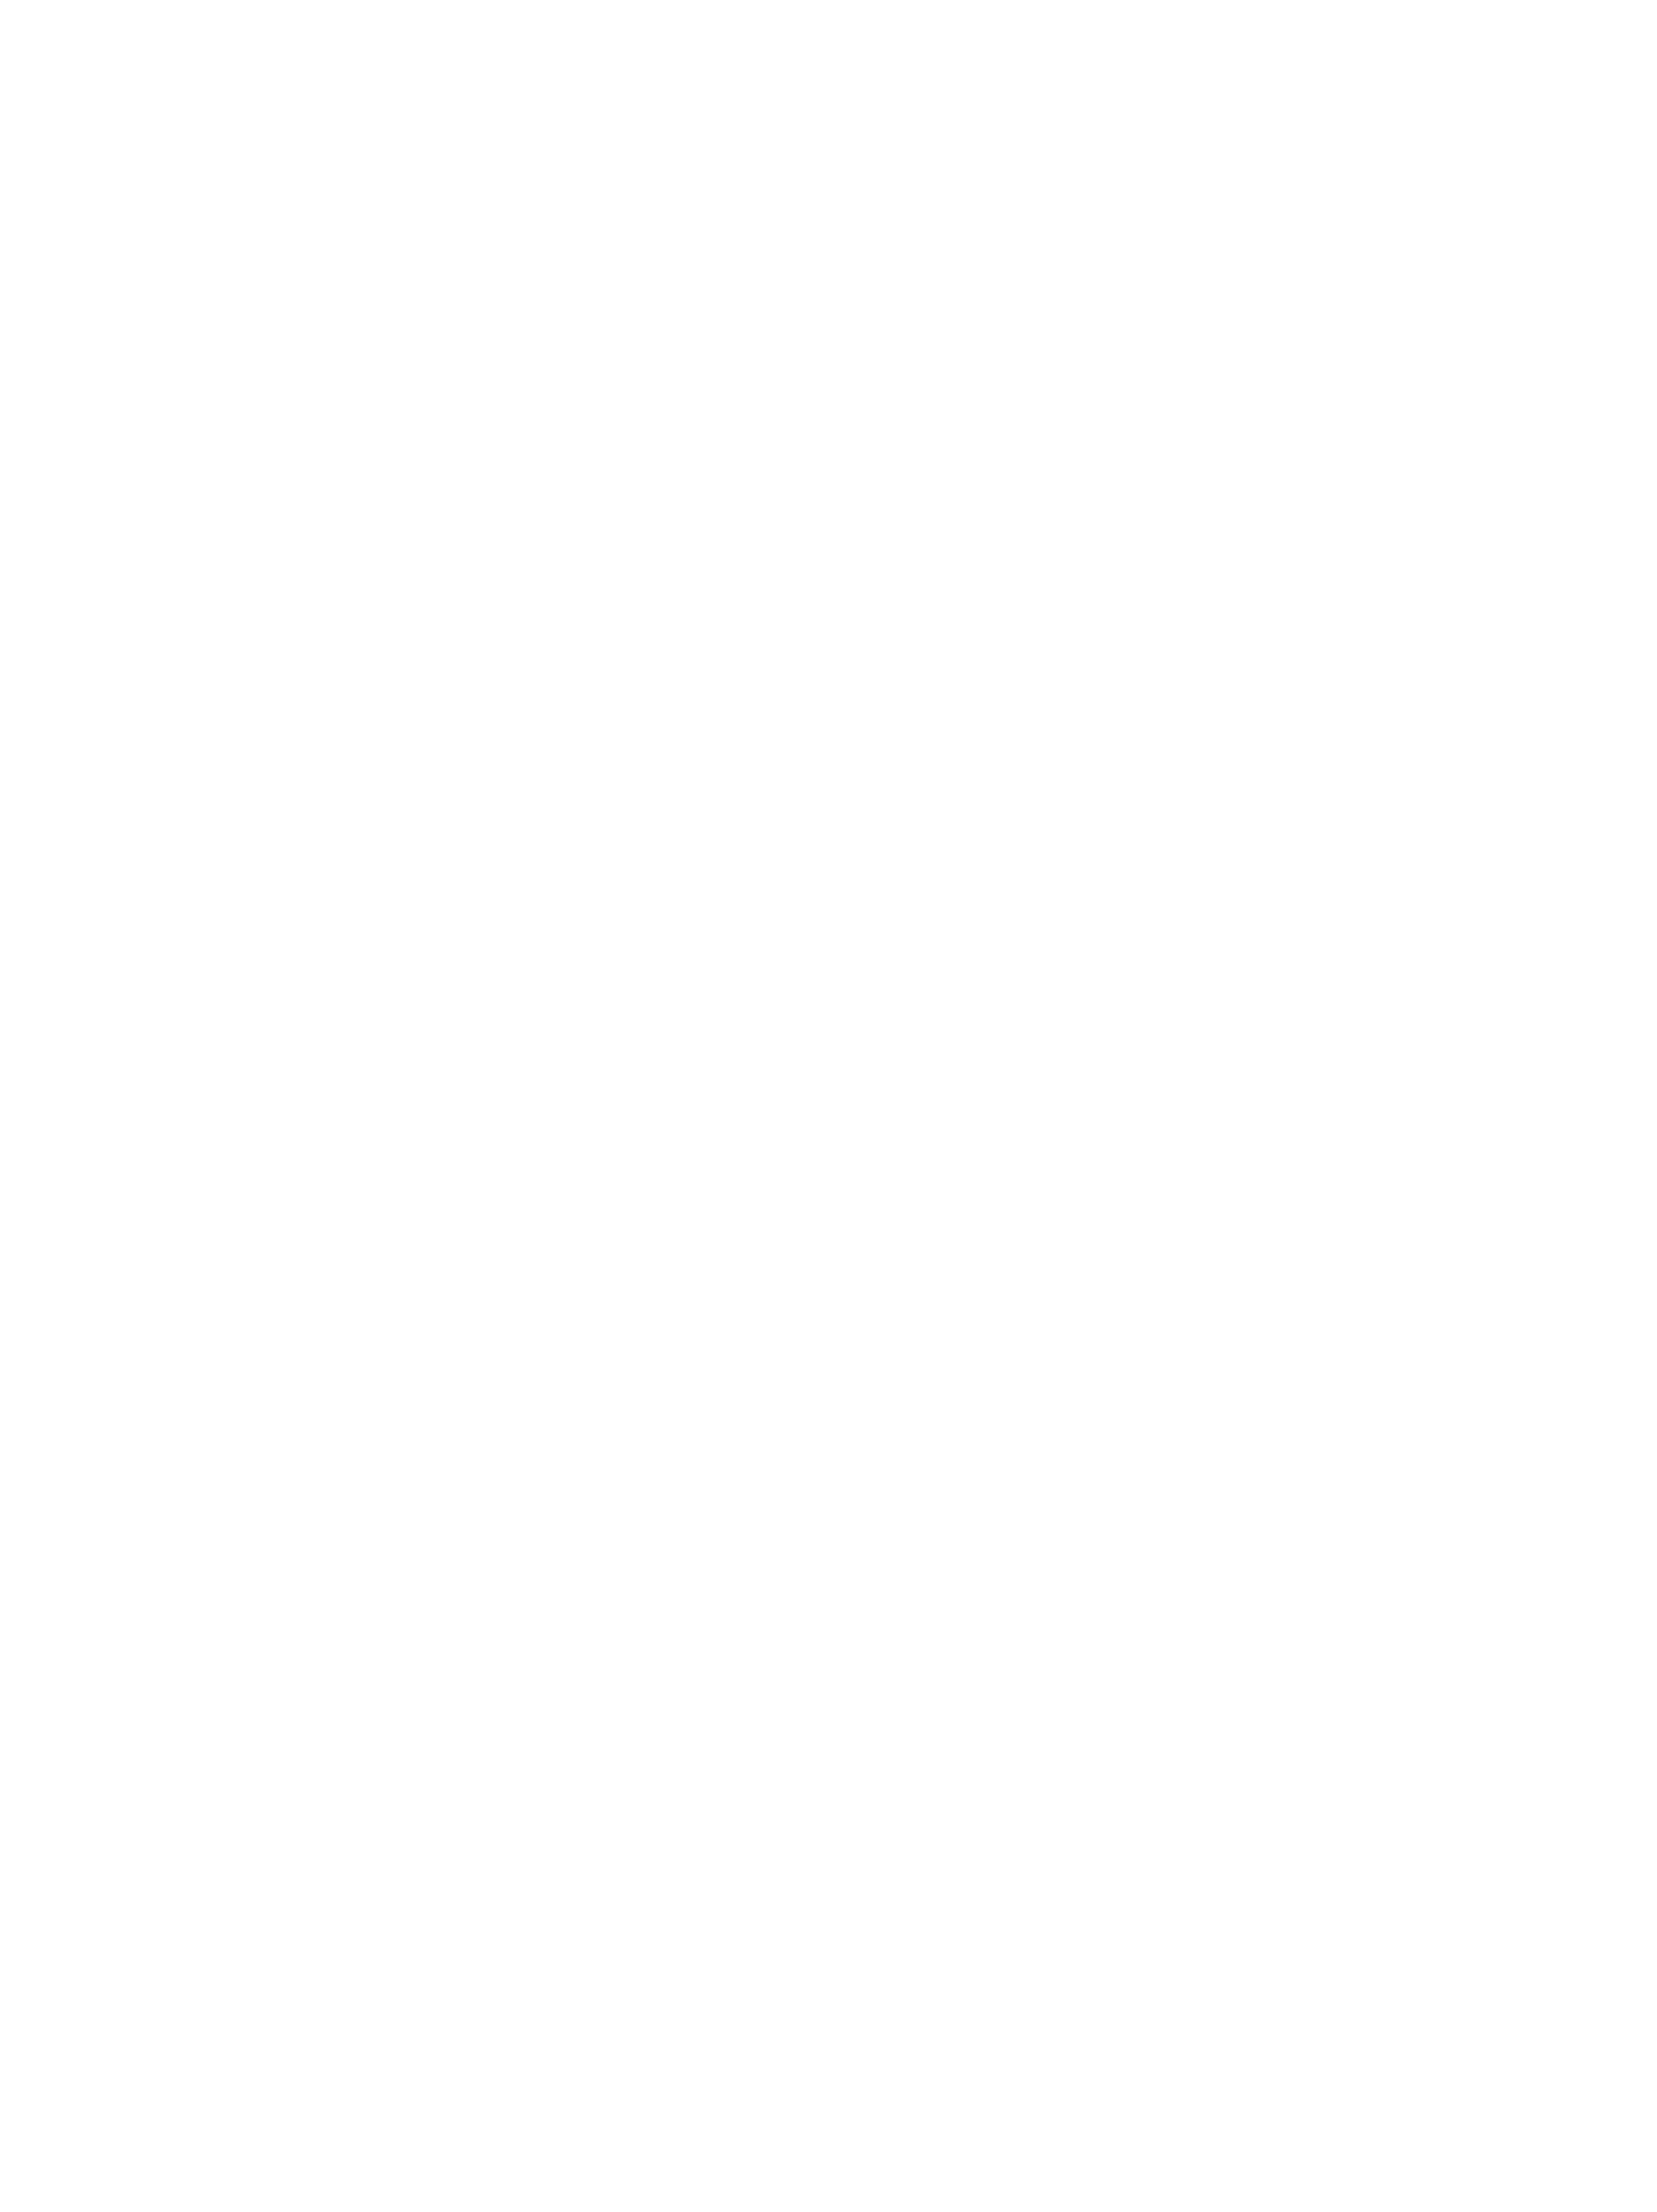 Joseph Woods Builders